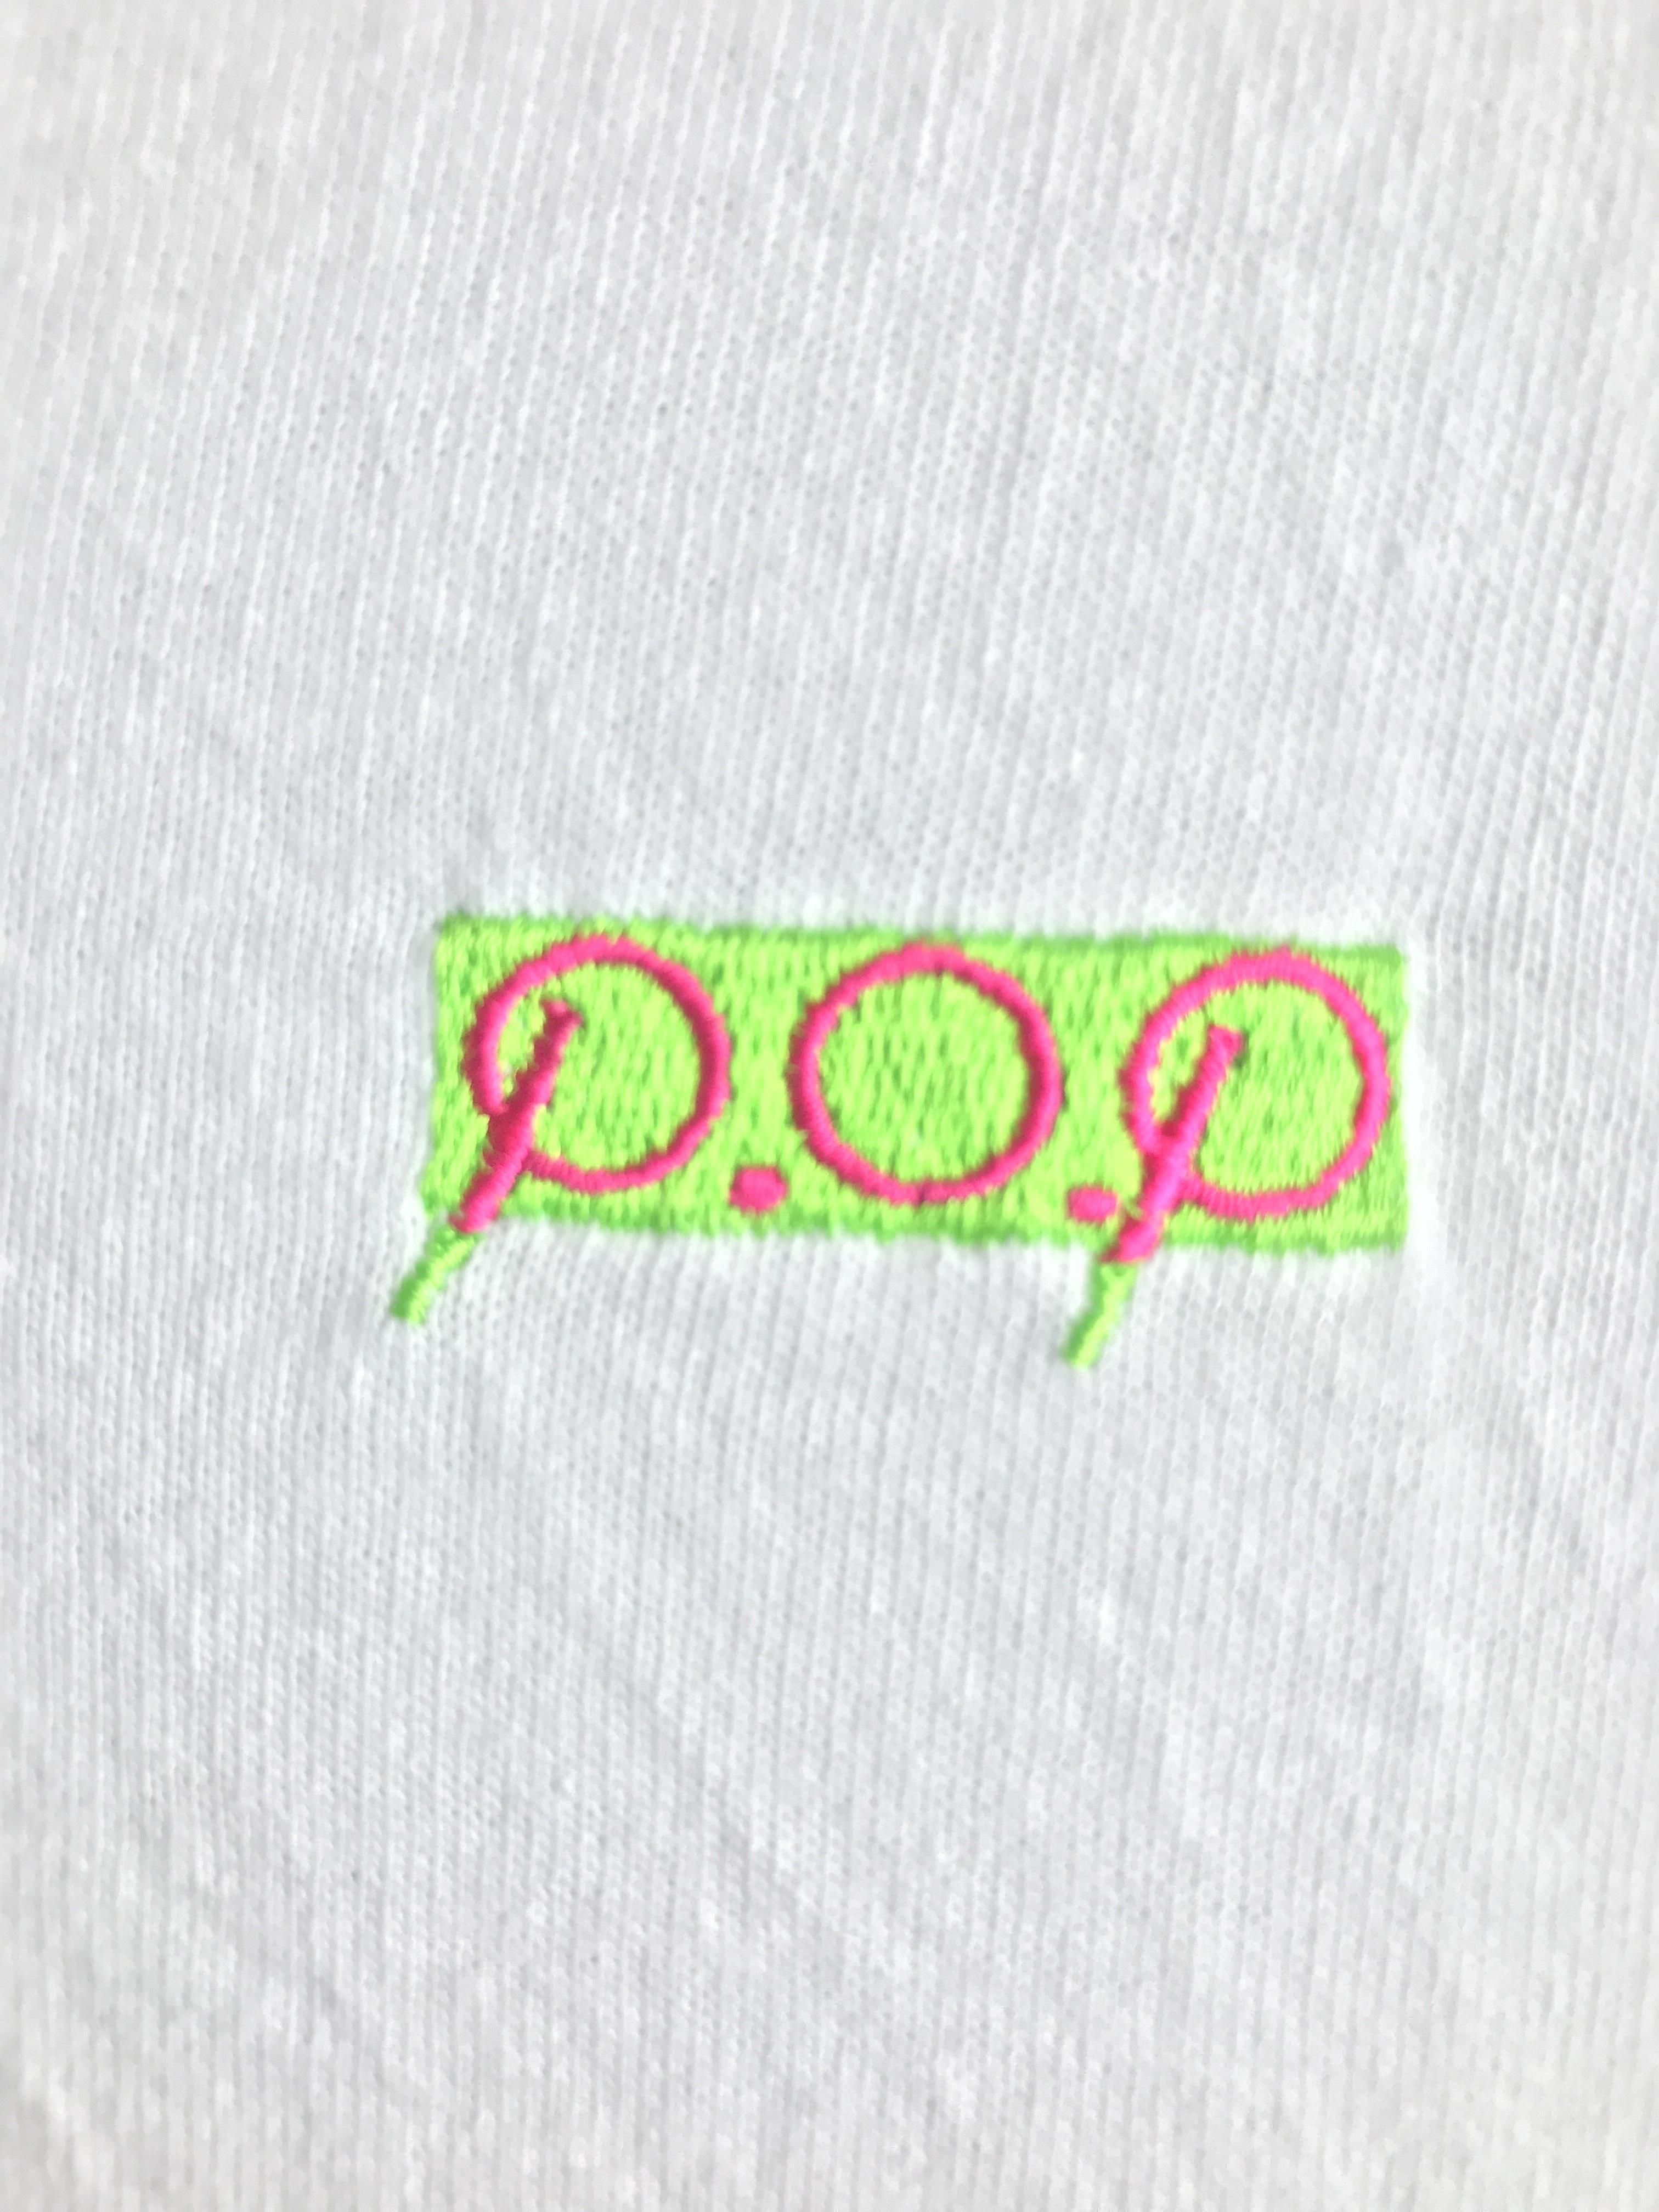 P.O.Pボックスロゴ刺繍 Tシャツ(ホワイト) - 画像2